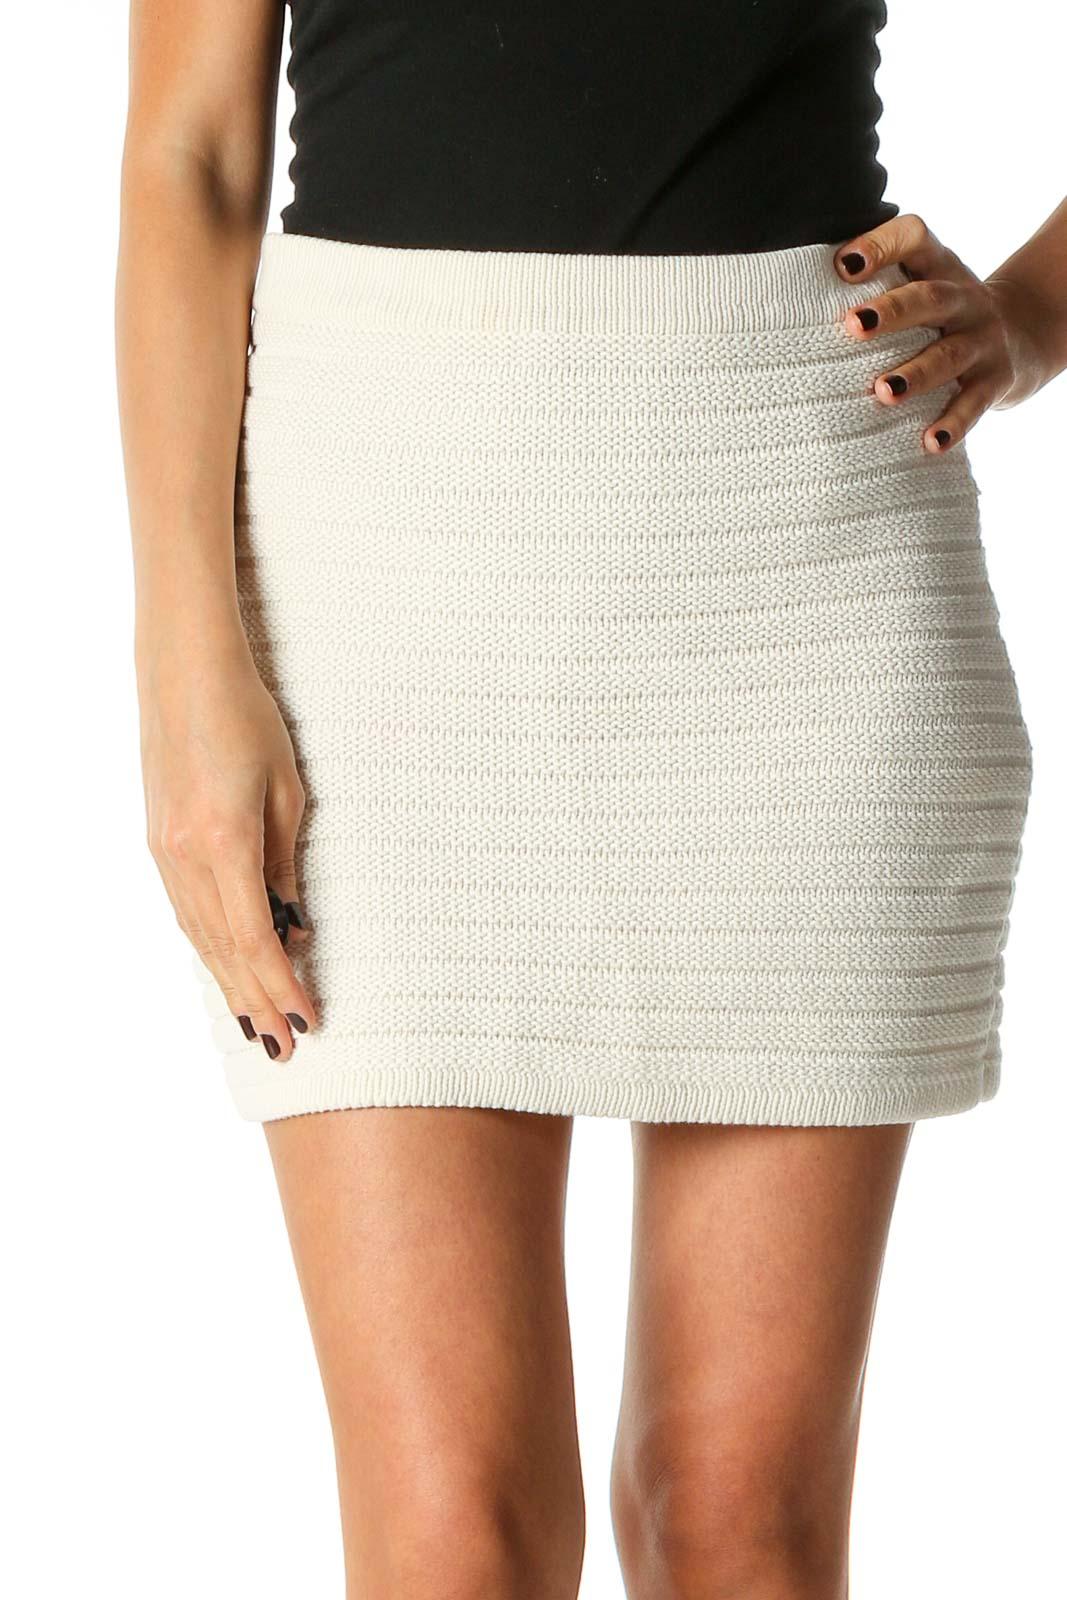 White Textured Chic Skirt Front